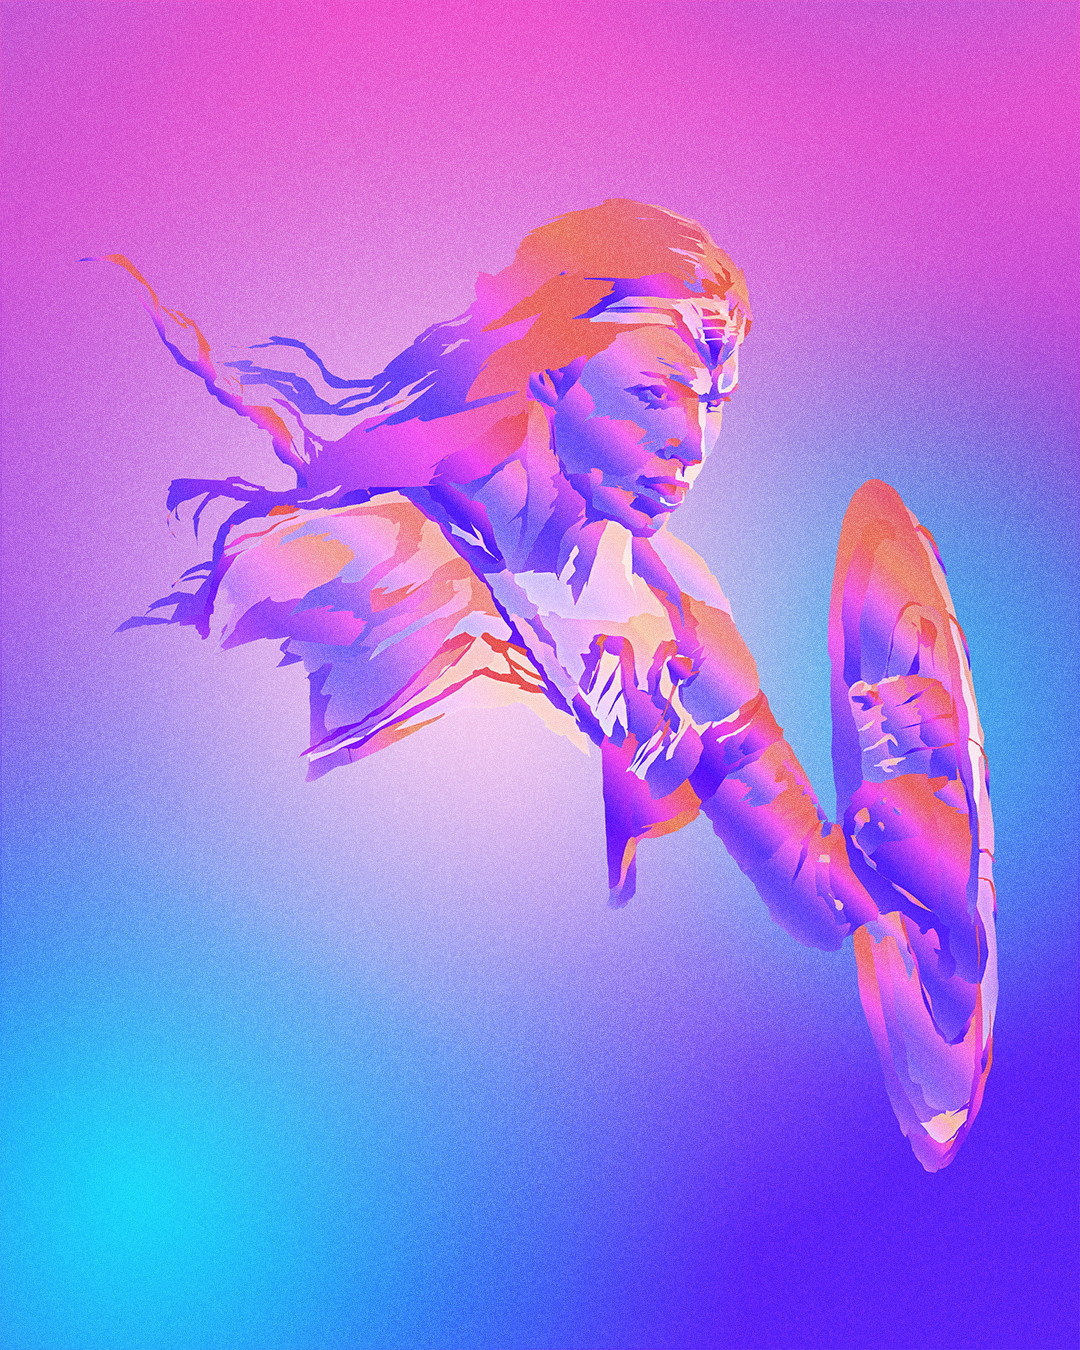 Nick tam full masaolab justiceleague colorillustration wonderwoman v1